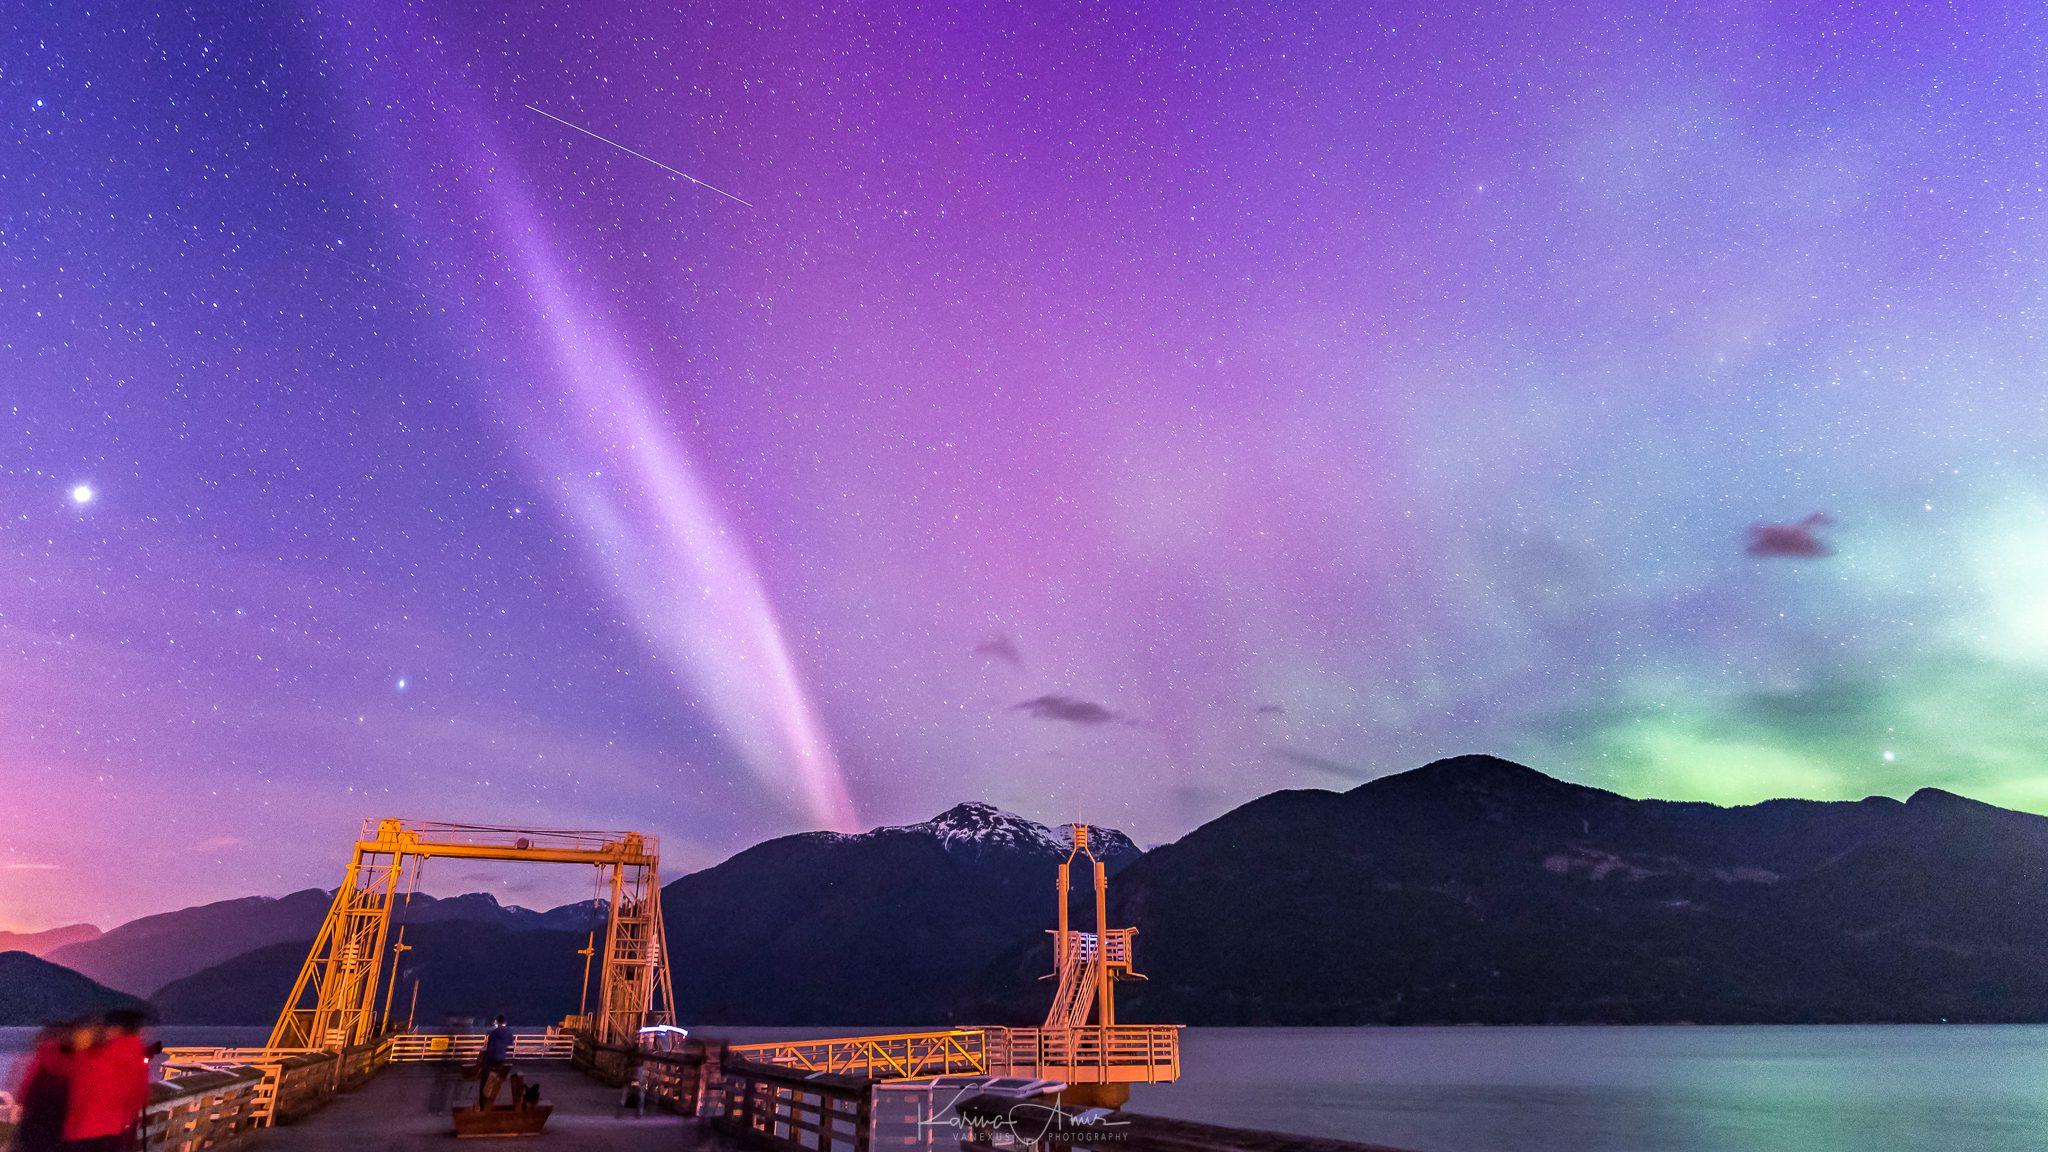 A pink aurora lights up a purple sky